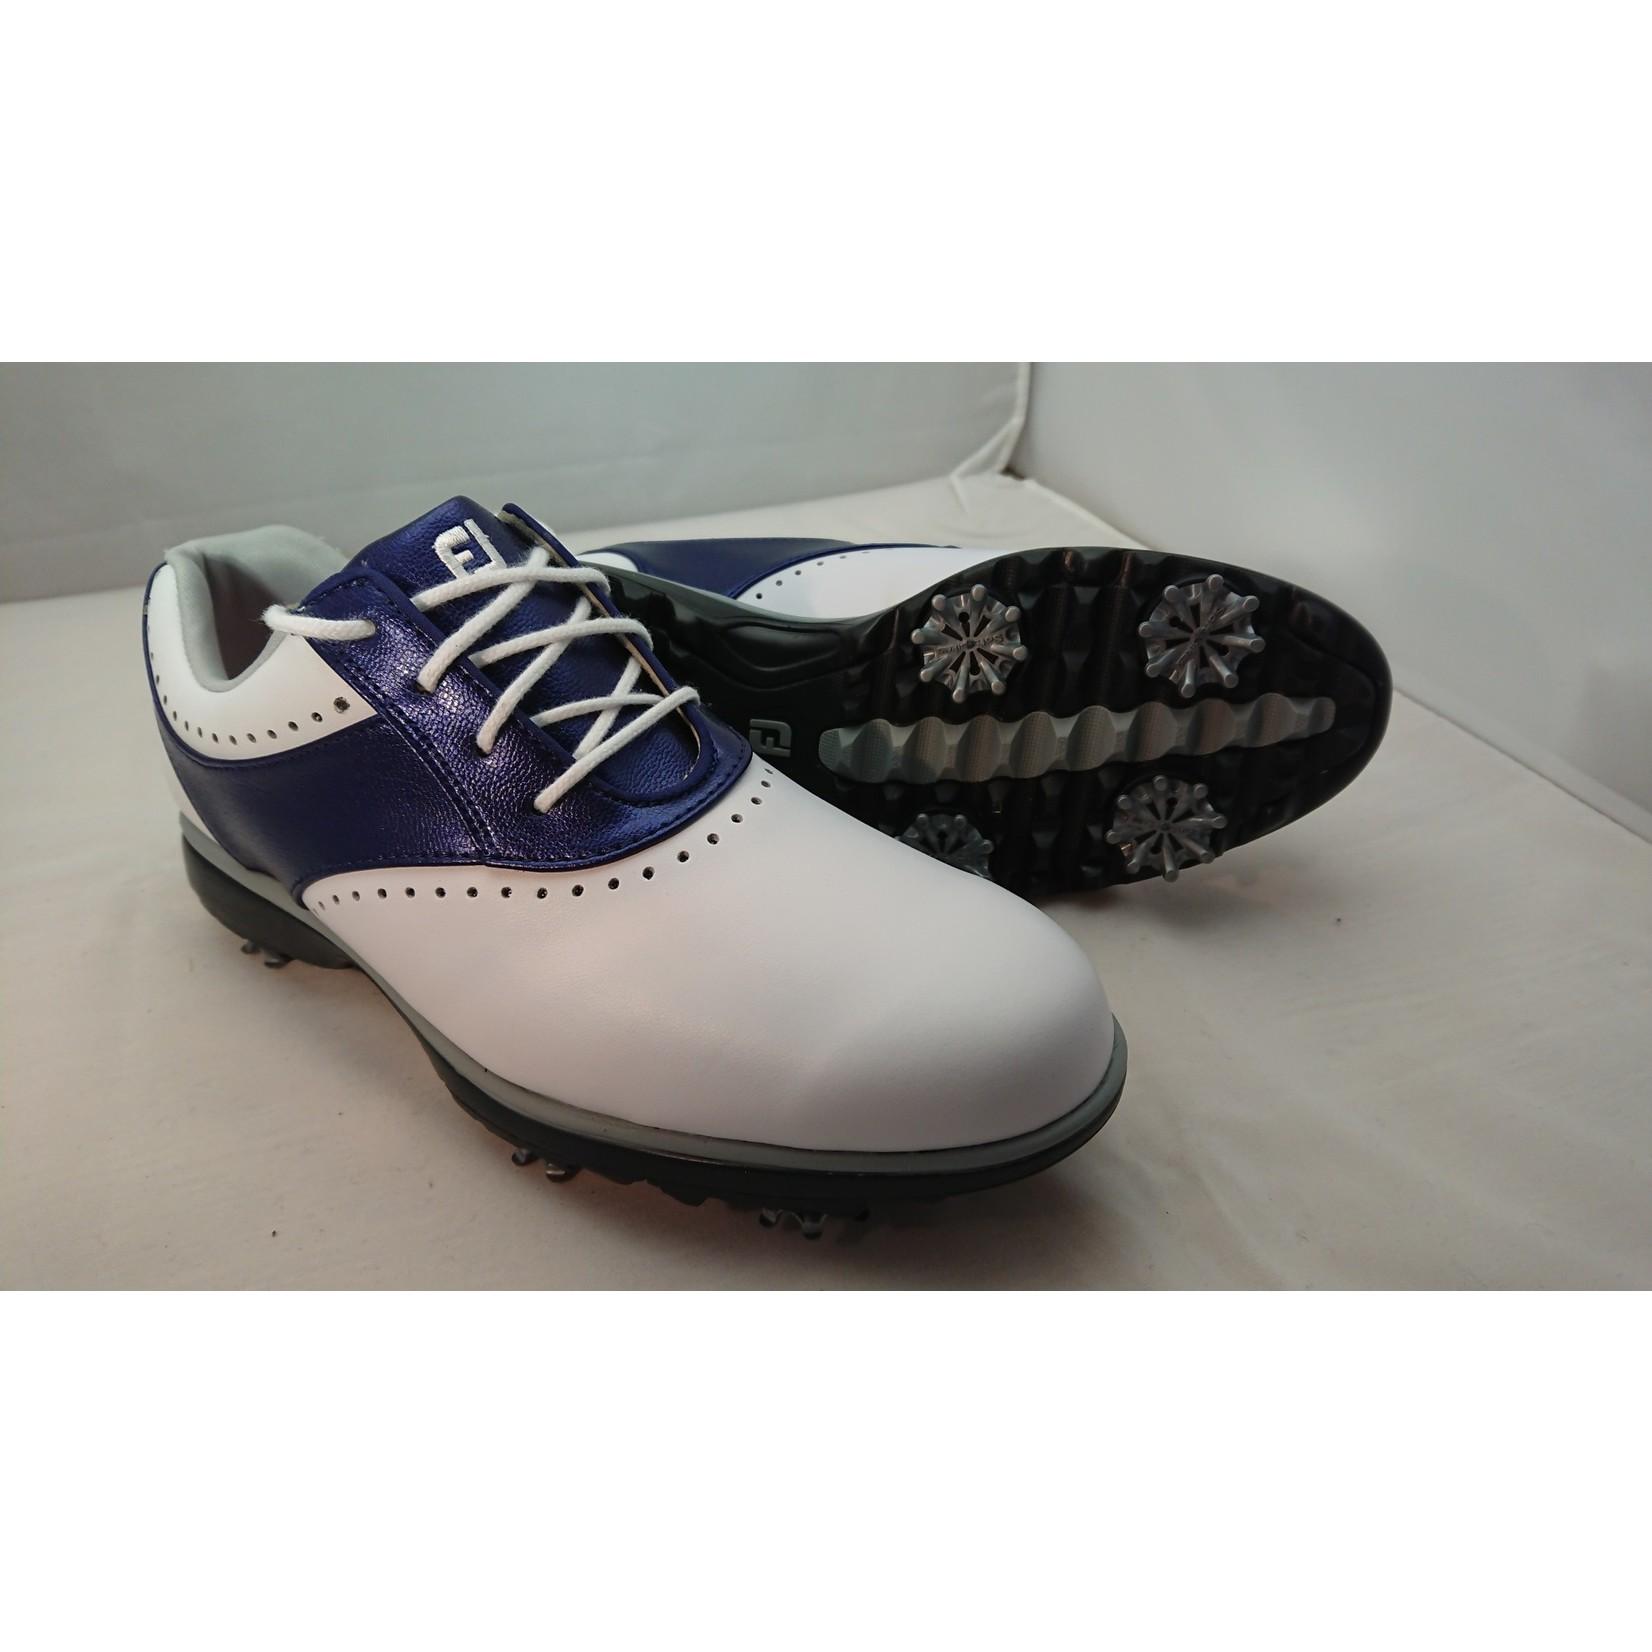 Footjoy Footjoy eMerge Wit/Blauw 38